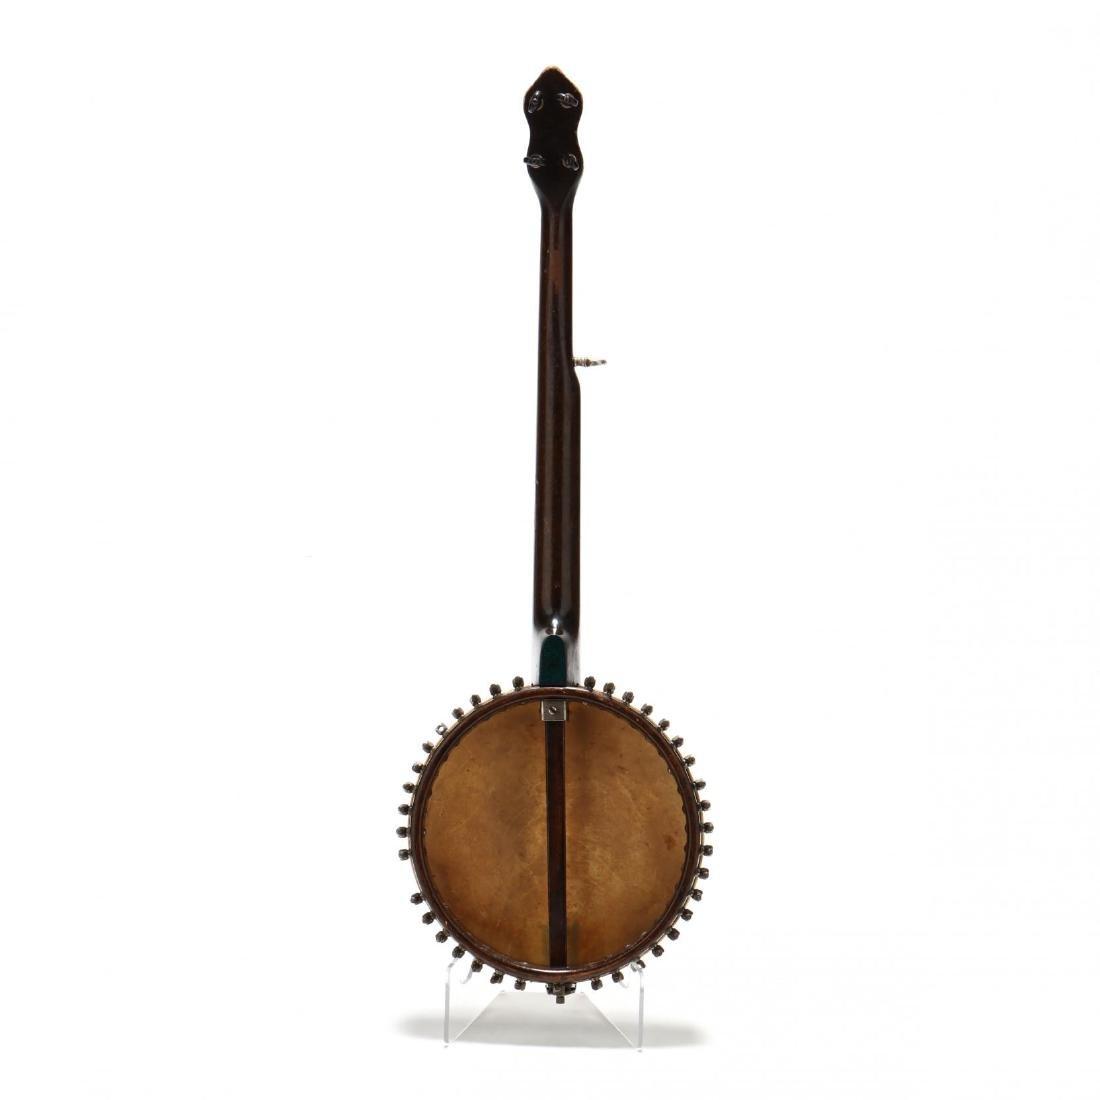 Unmarked Novelty 5-String Open Back Banjo - 5